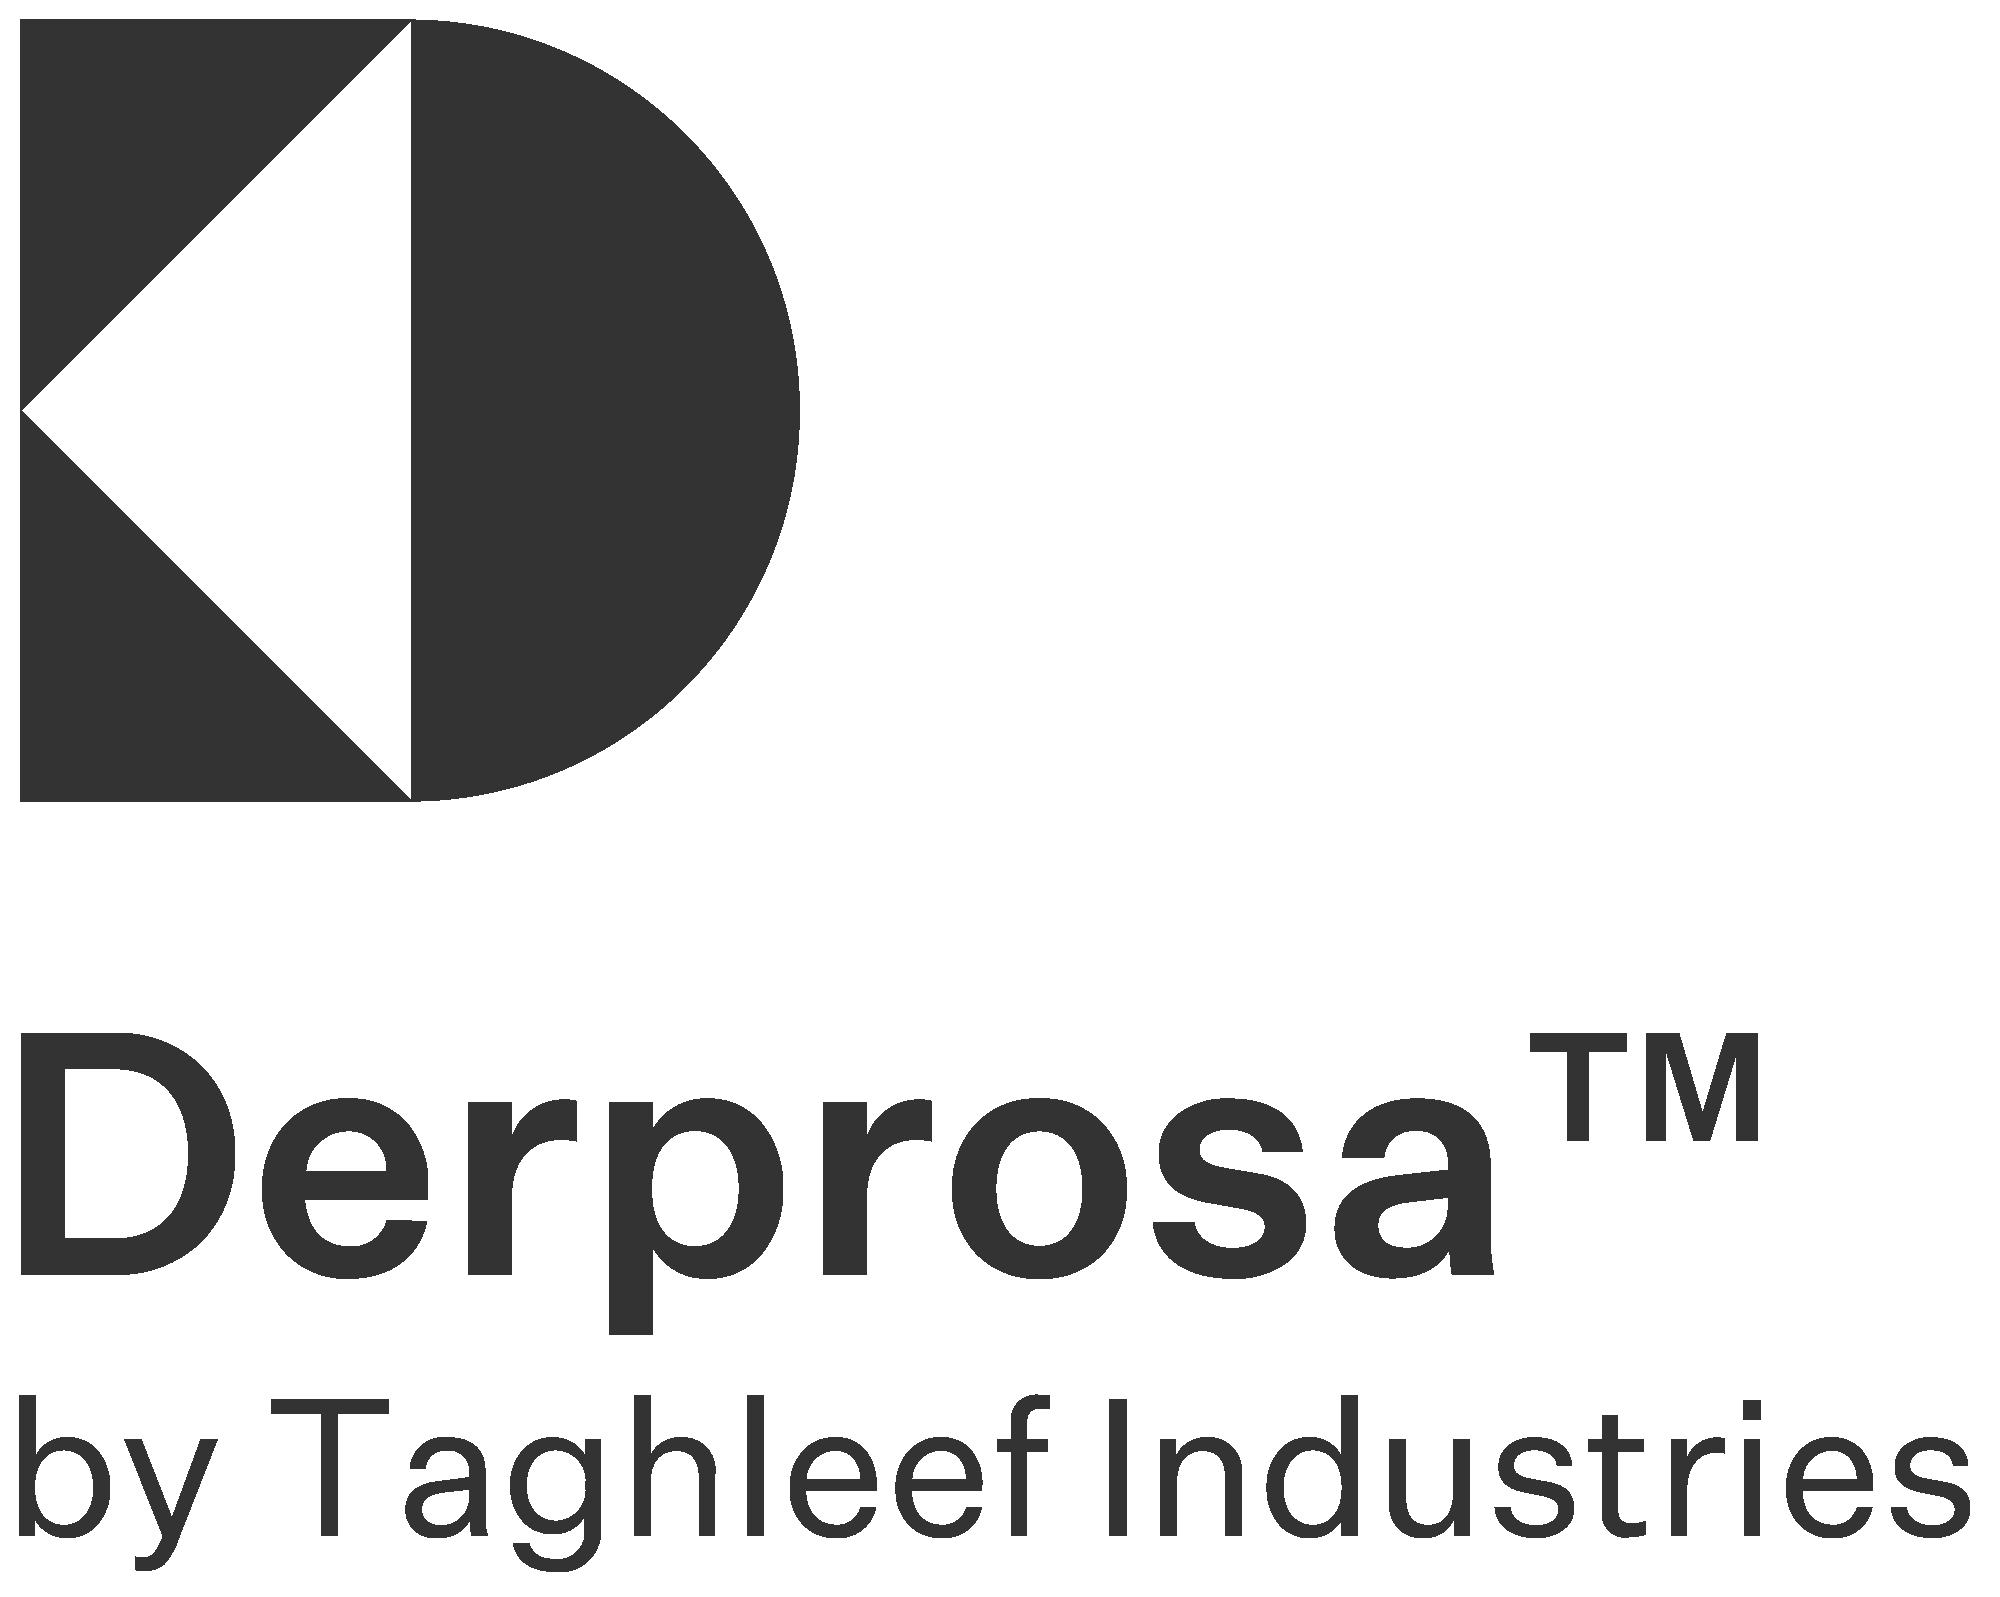 Derprosa by Taghleef Industries SL